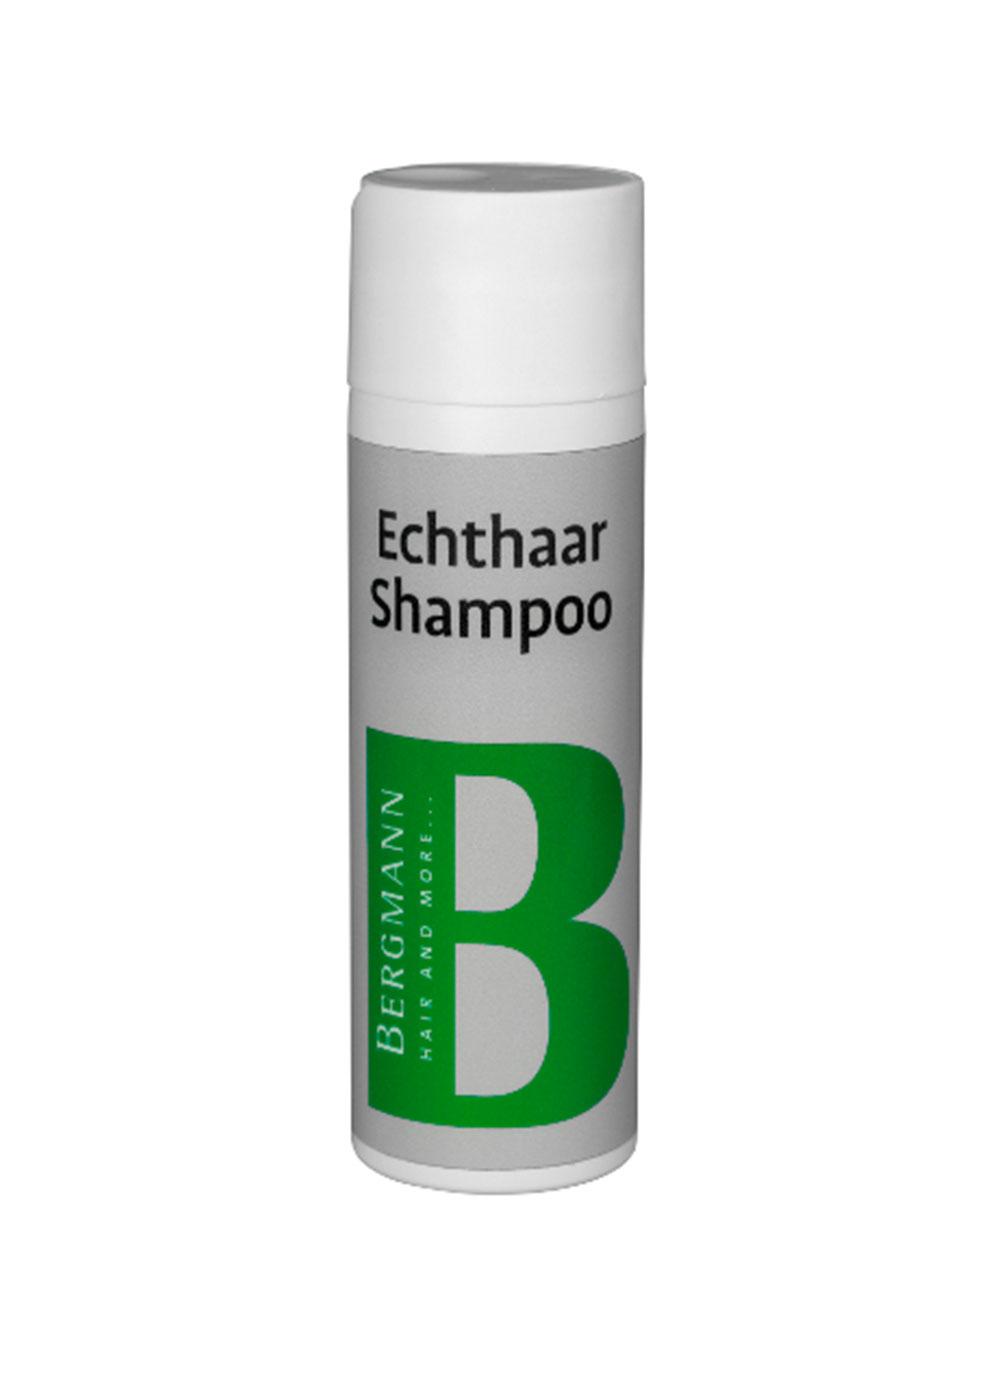 Bergmann Zubehör - Echthaar Shampoo 200ml